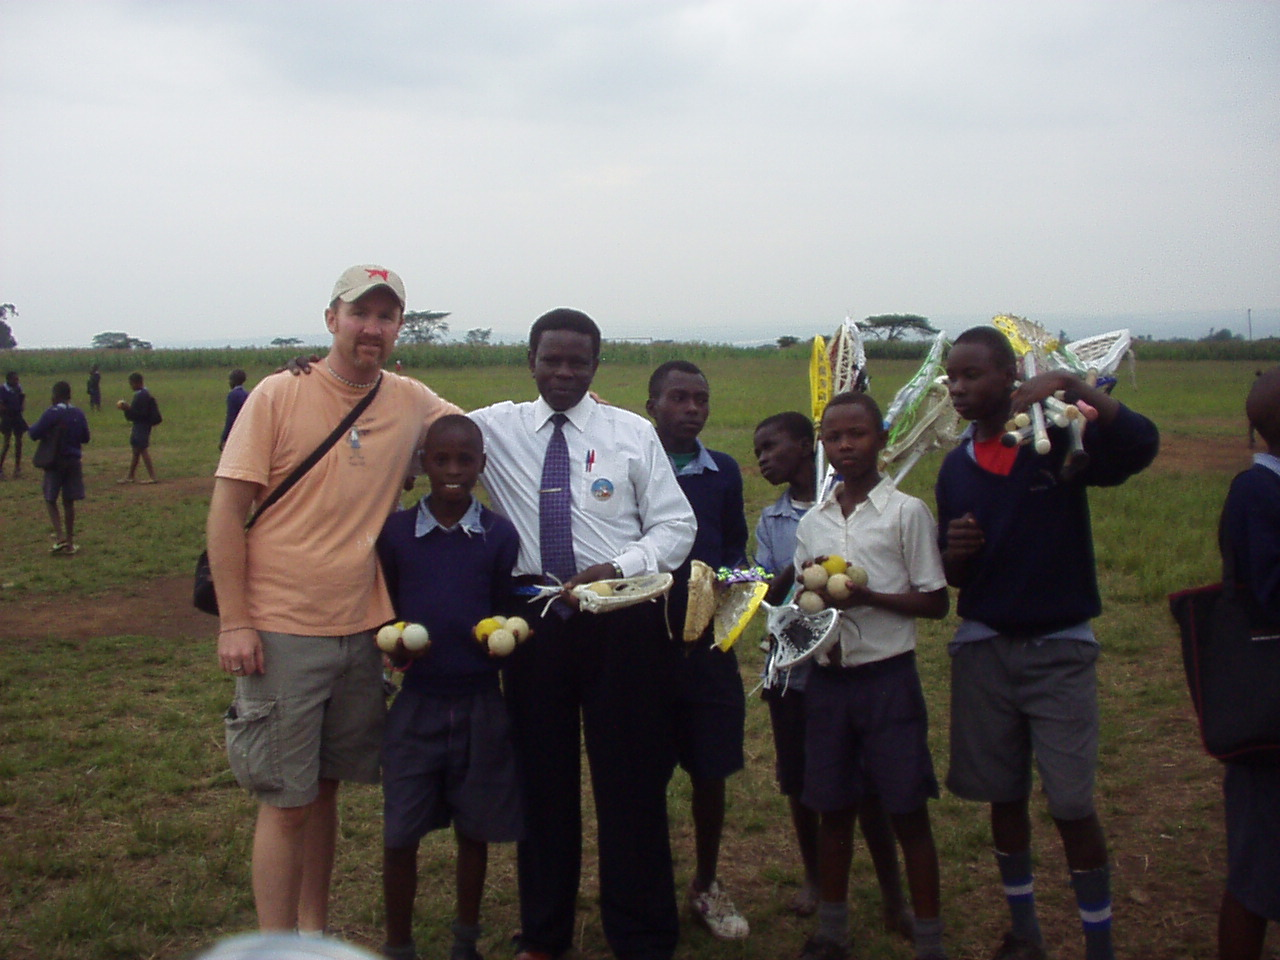 Lacrosse Meets Kenya through World Teacher Aid with Dave Gardner of BasicLacrosse.com